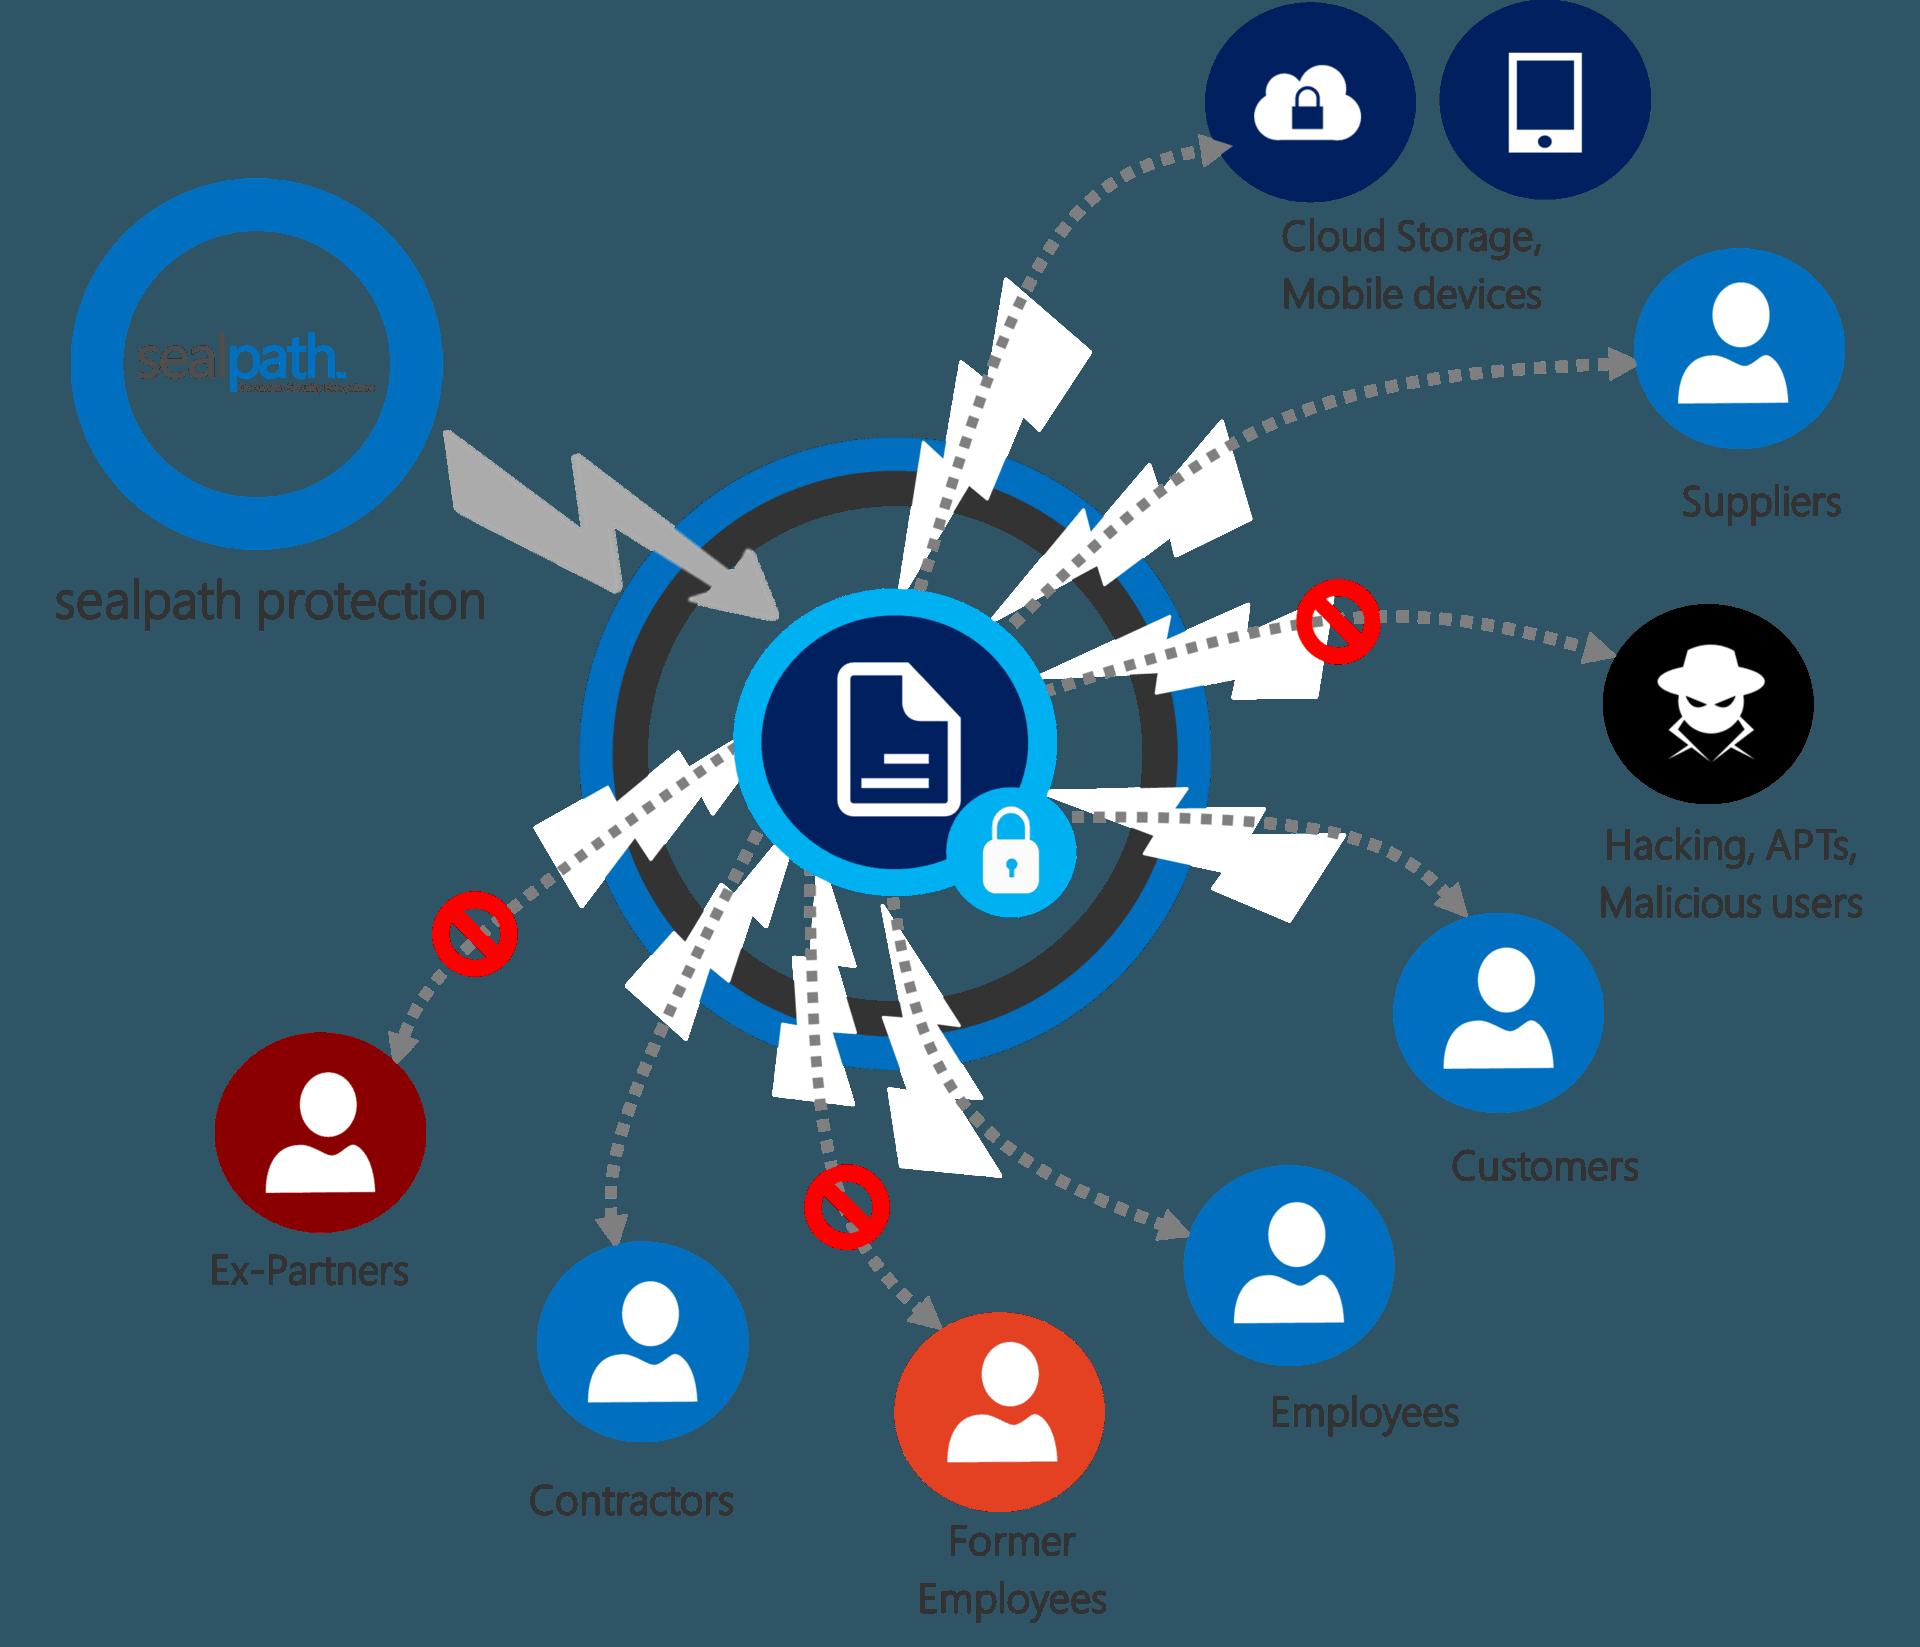 SealPath Document Protection